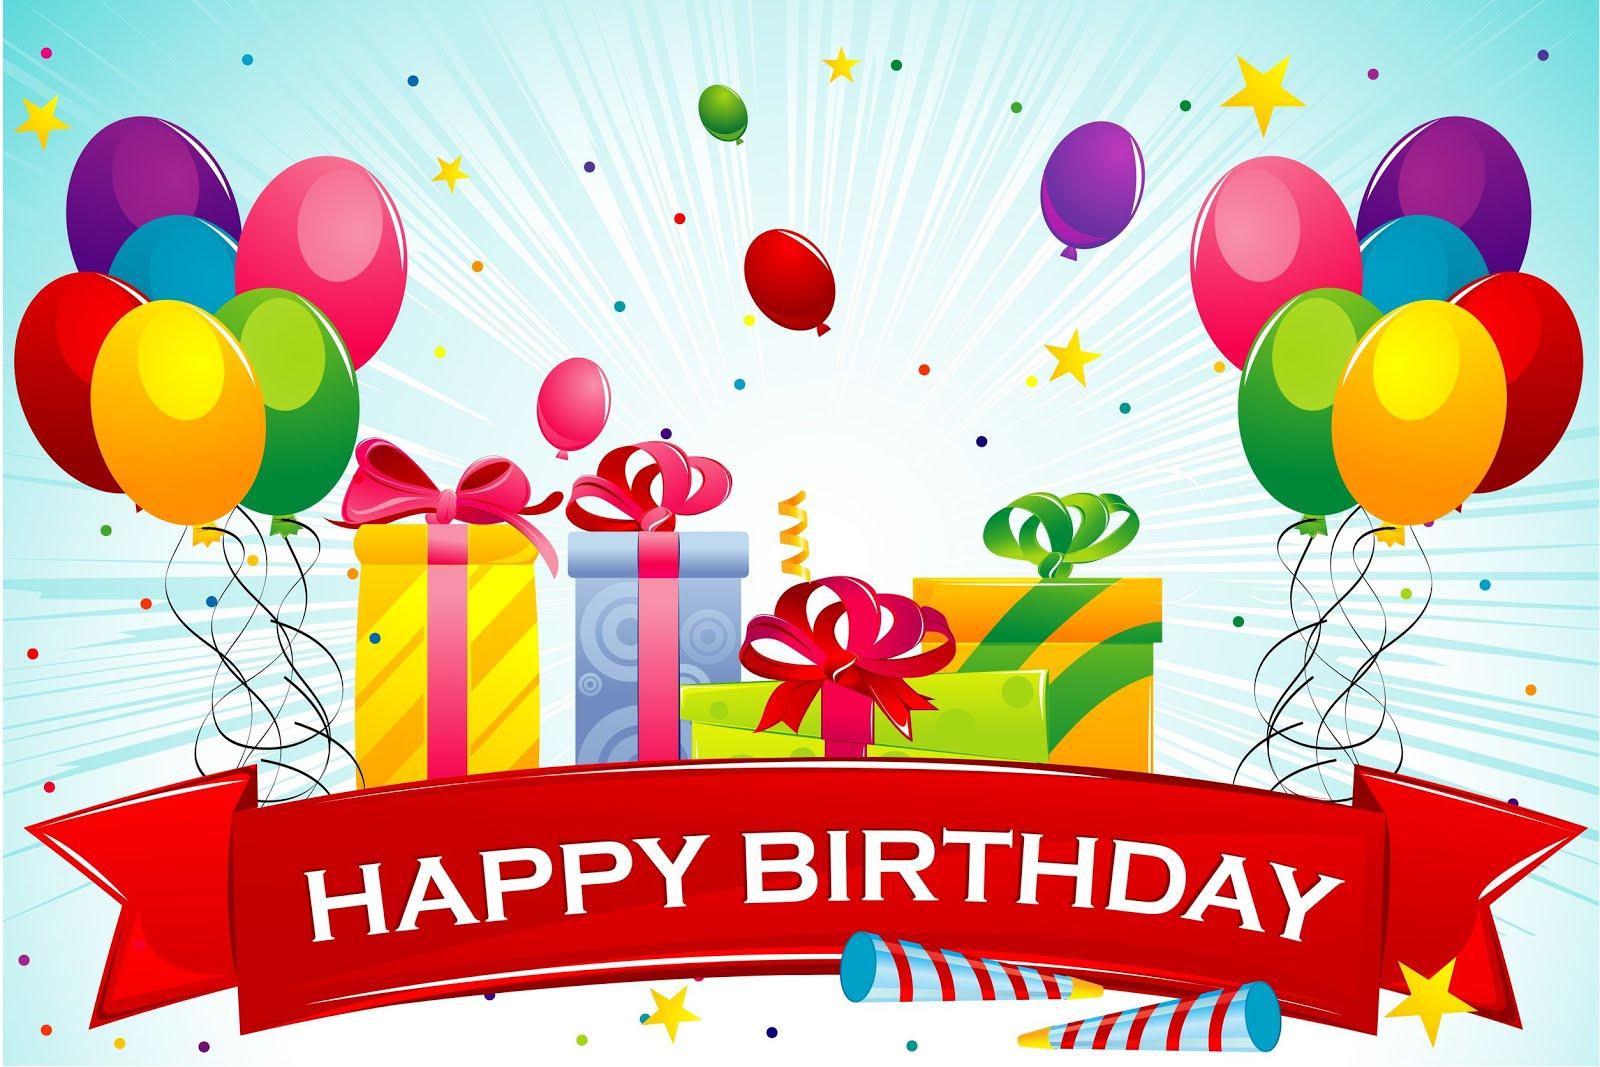 https://i1.wp.com/www.itsnotaboutme.tv/news/wp/wp-content/uploads/postal_de_cumplea_os_con_mensaje_happy_birthday_para_compartir.jpg